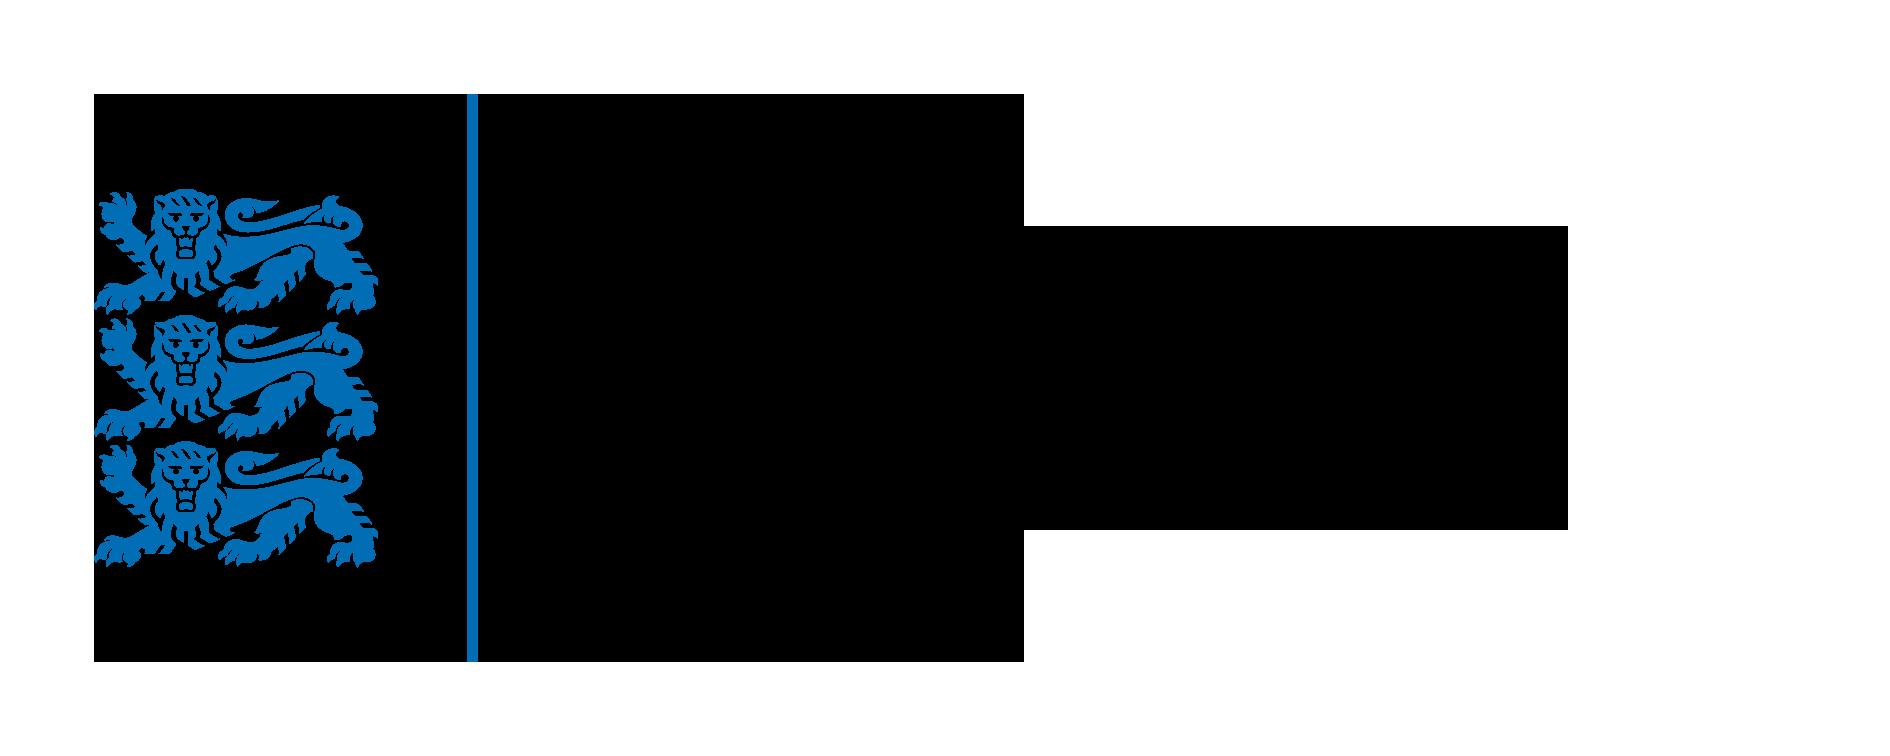 0_haridusmin_3lovi_eng